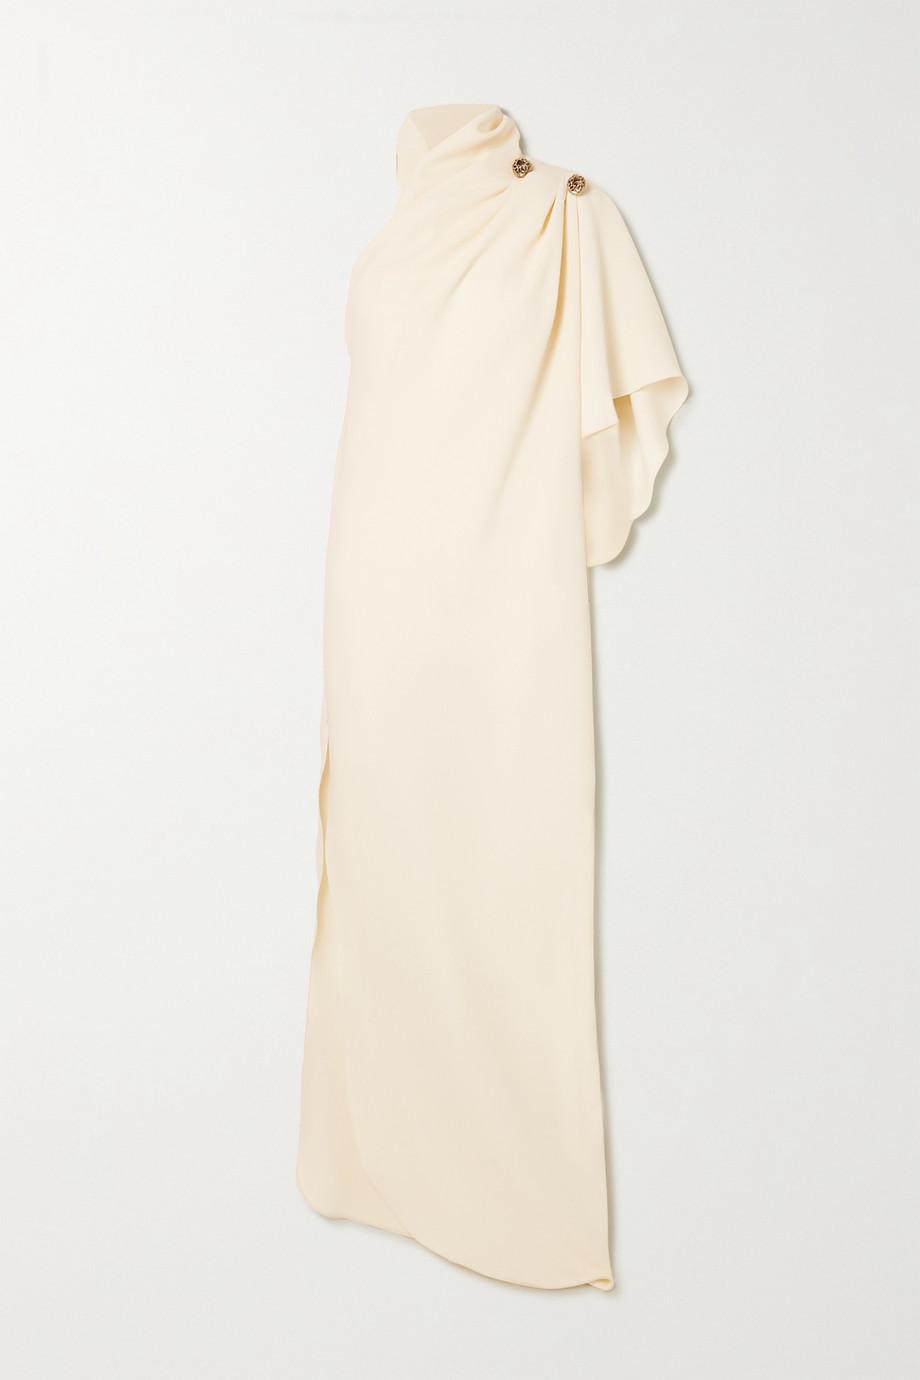 Elie Saab One-sleeve embellished draped crepe gown